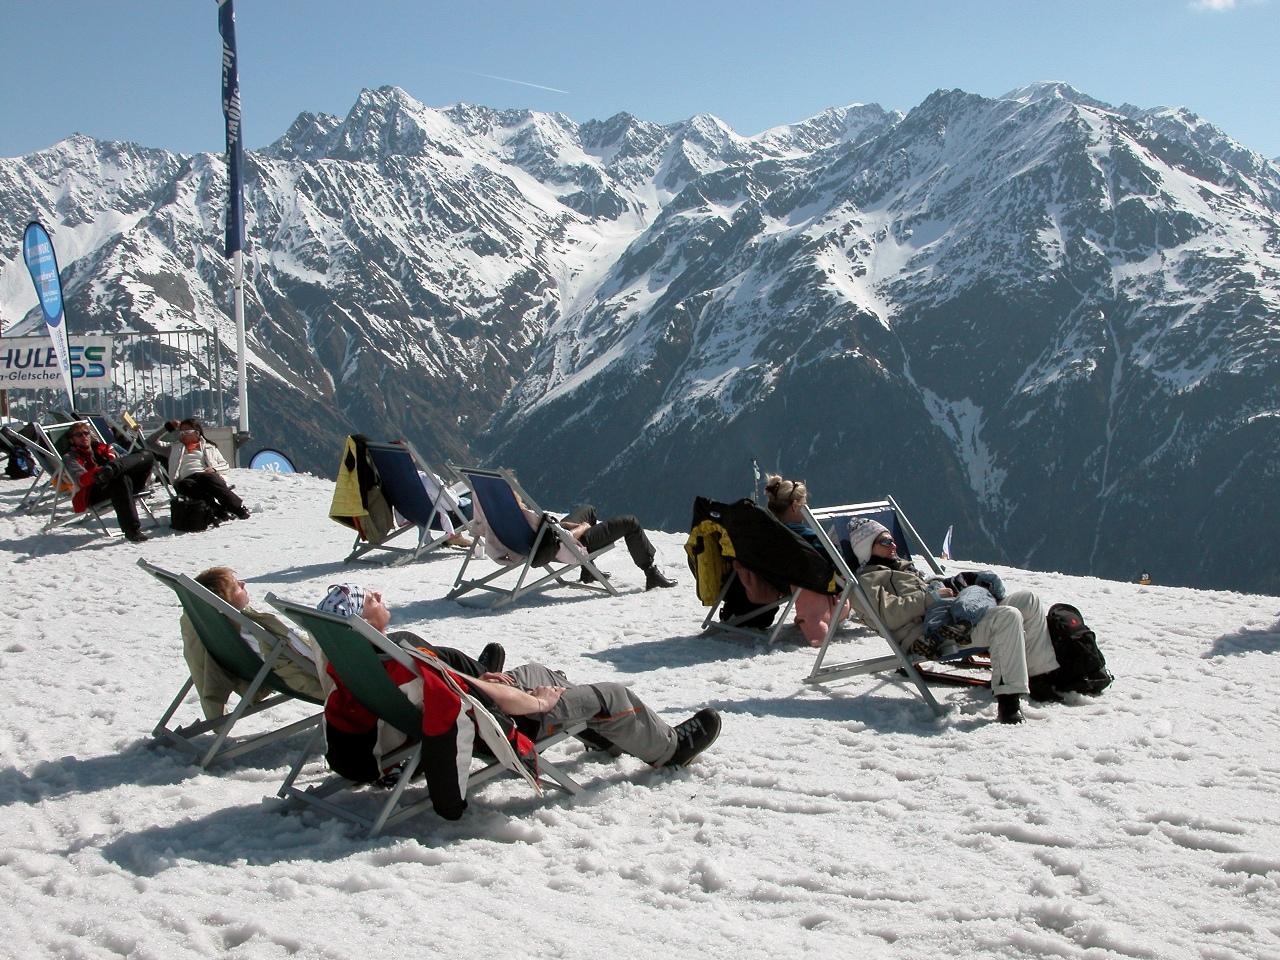 Релакс по-альпийски